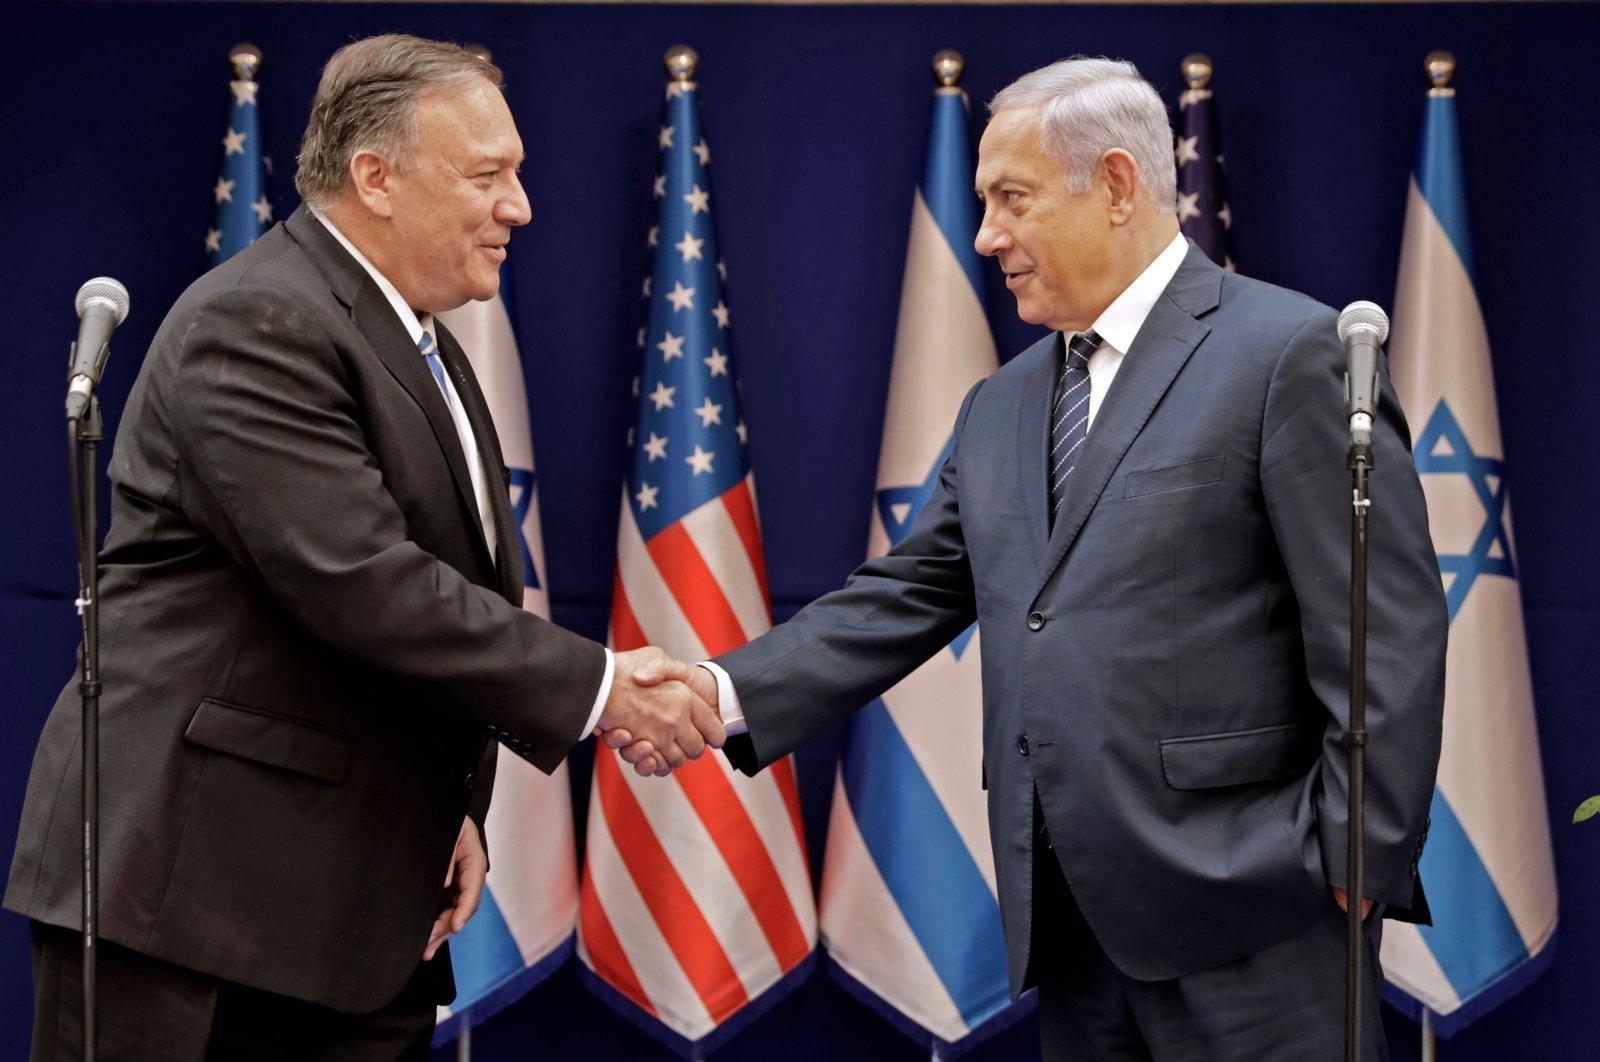 Israeli Prime Minister Benjamin Netanyahu (R) shakes the hand of U.S. Secretary of State Mike Pompeo, Jerusalem, Oct. 18, 2019. (AFP Photo)